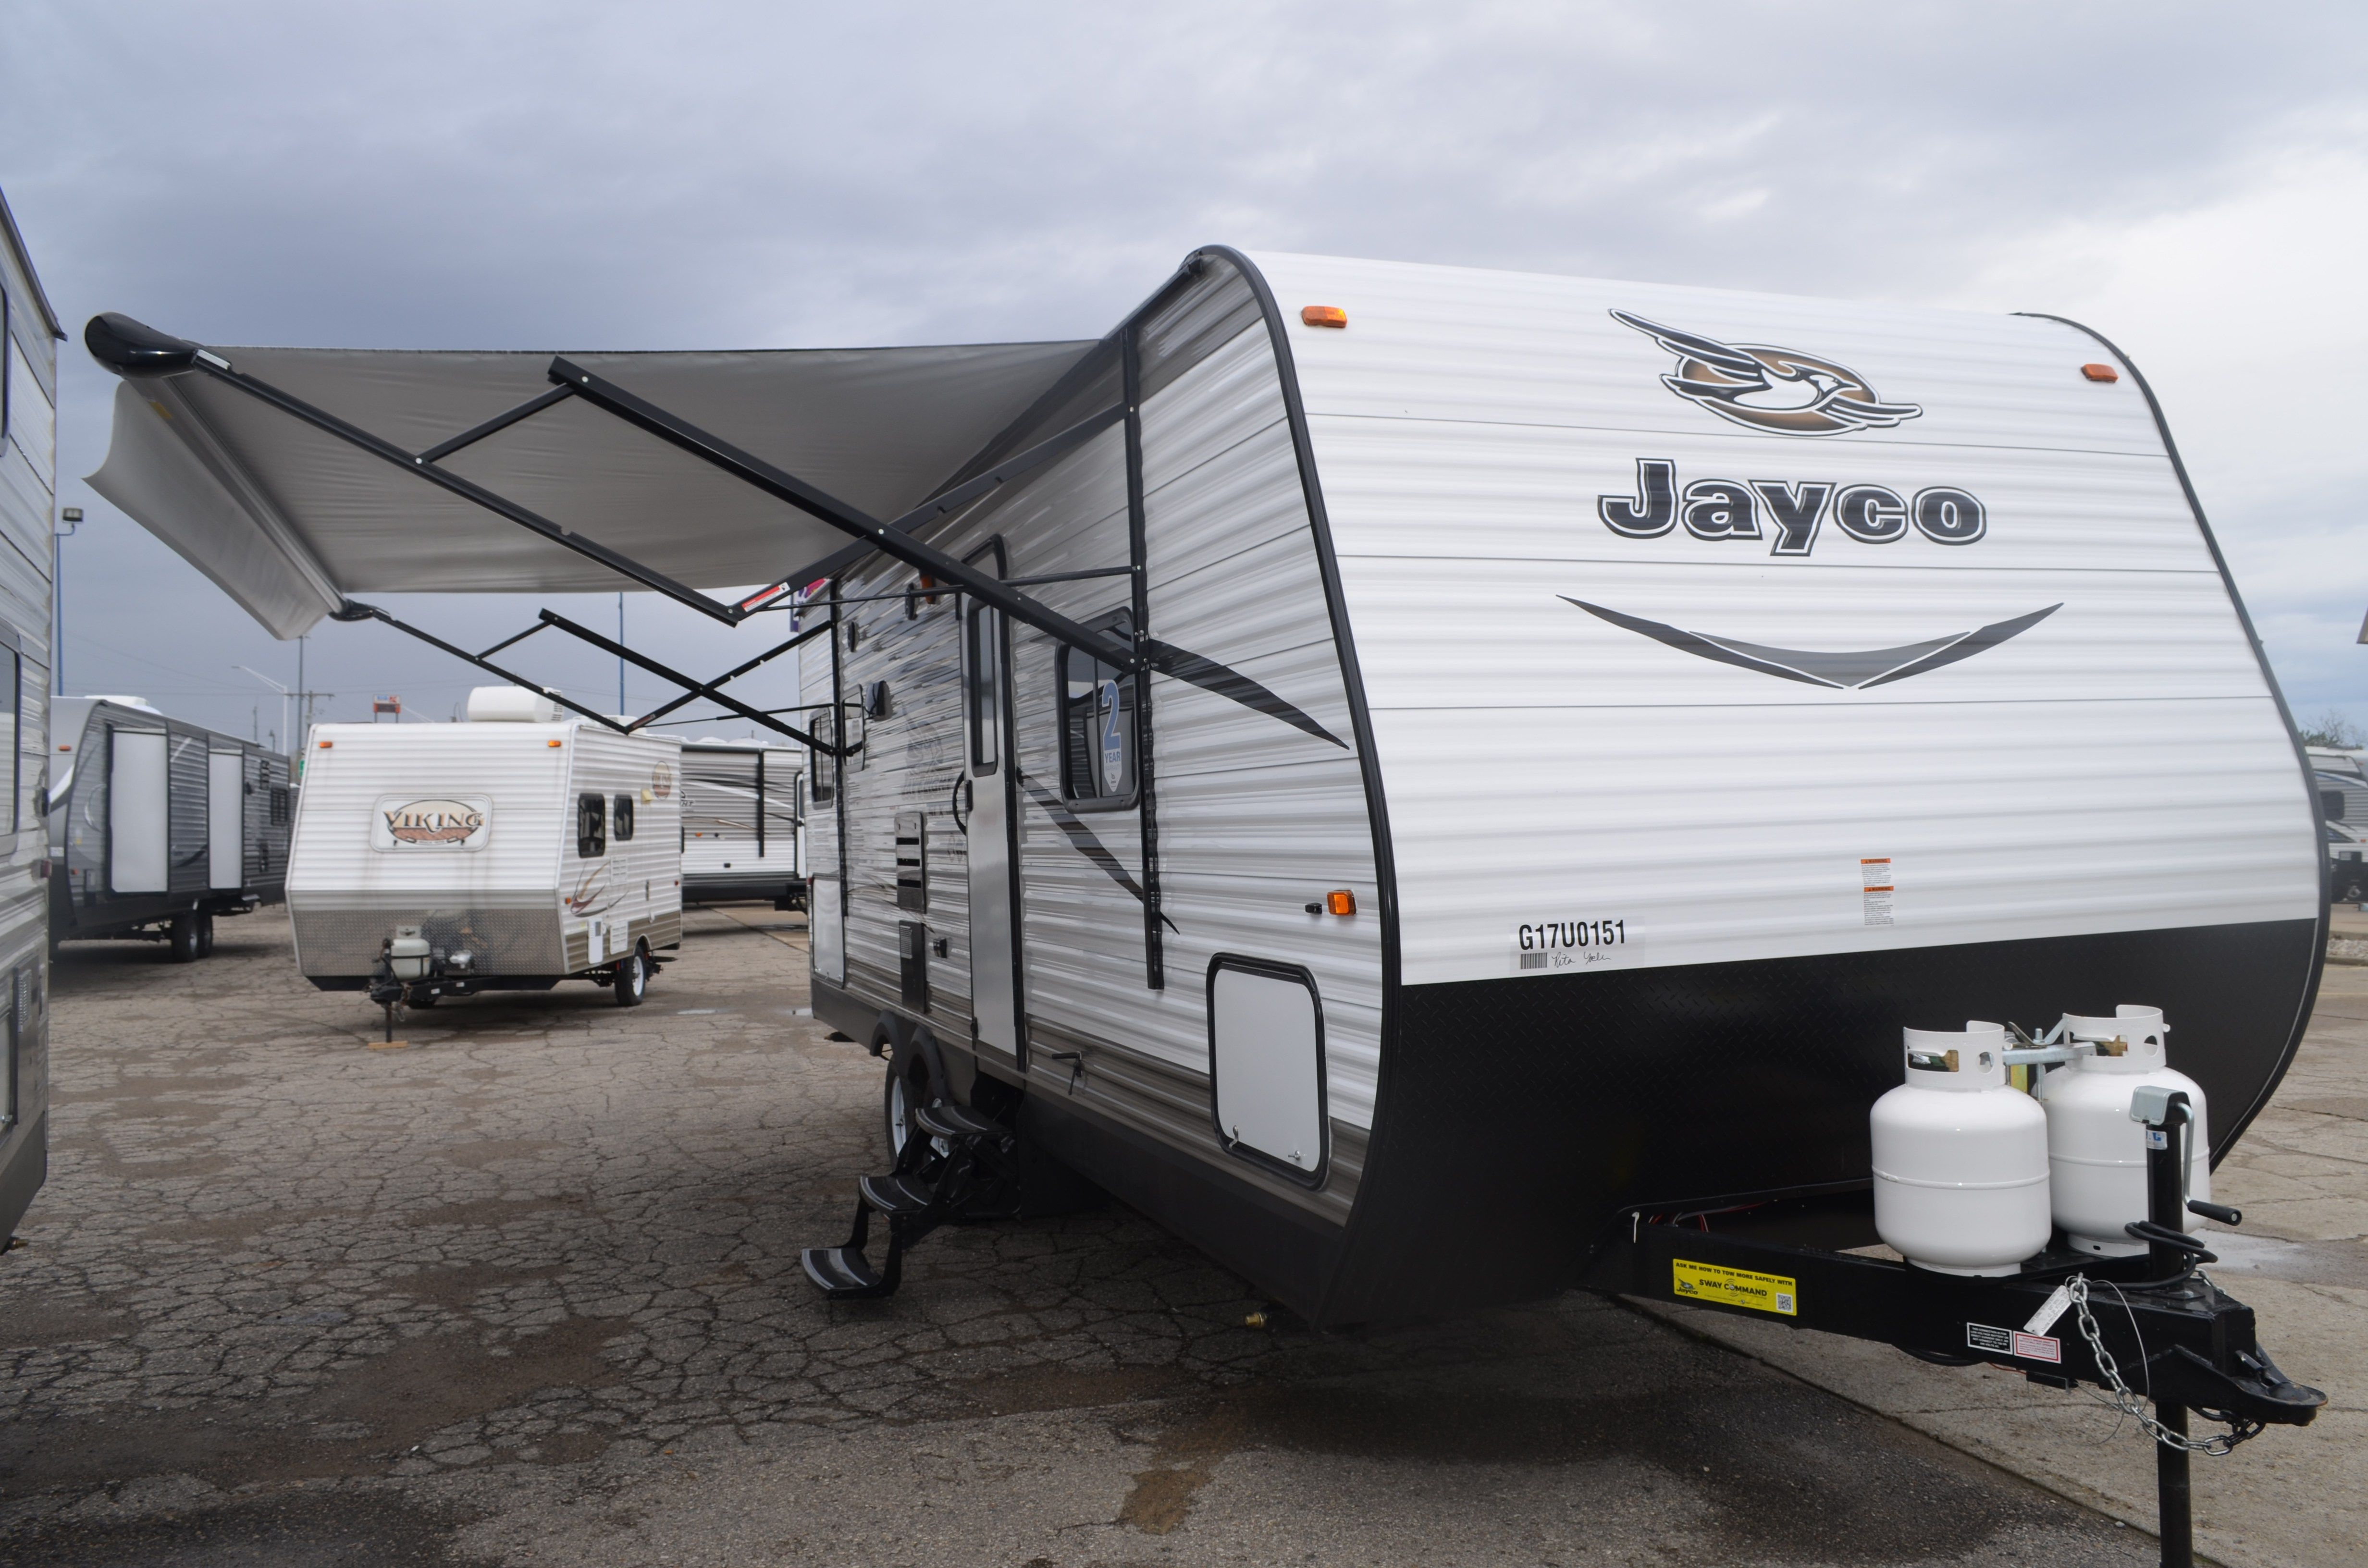 Inventory Jayco Rv Recreational Vehicles